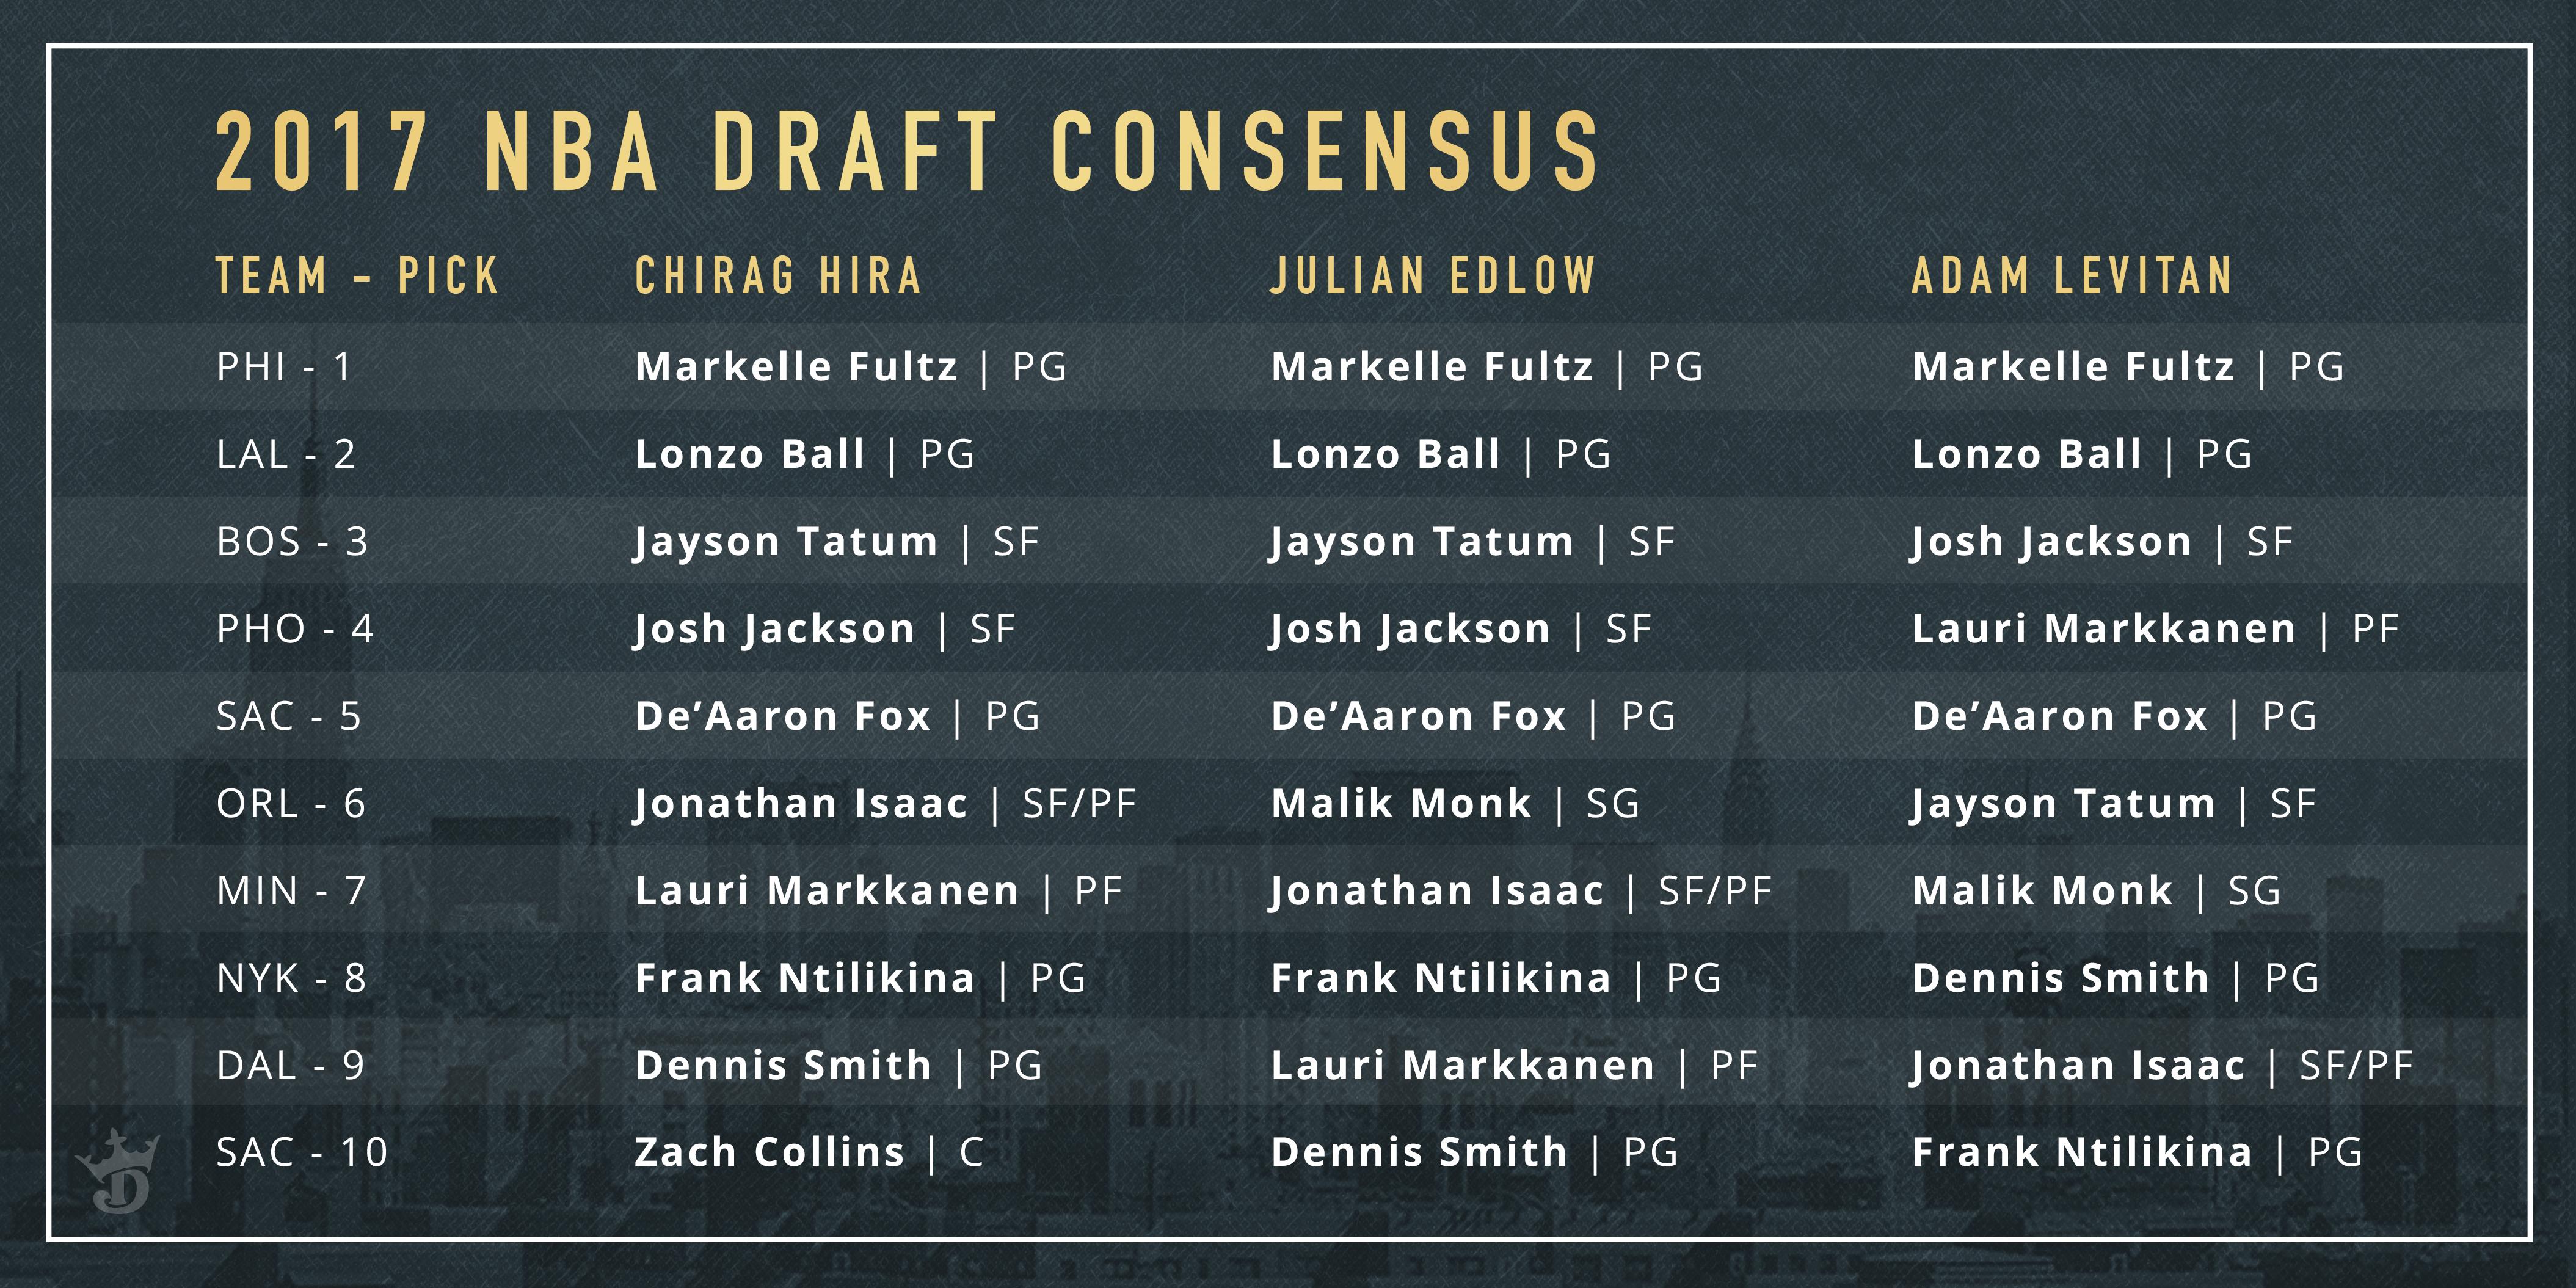 Consensus 2017 NBA Mock Draft - Top 10 Picks - DraftKings ...